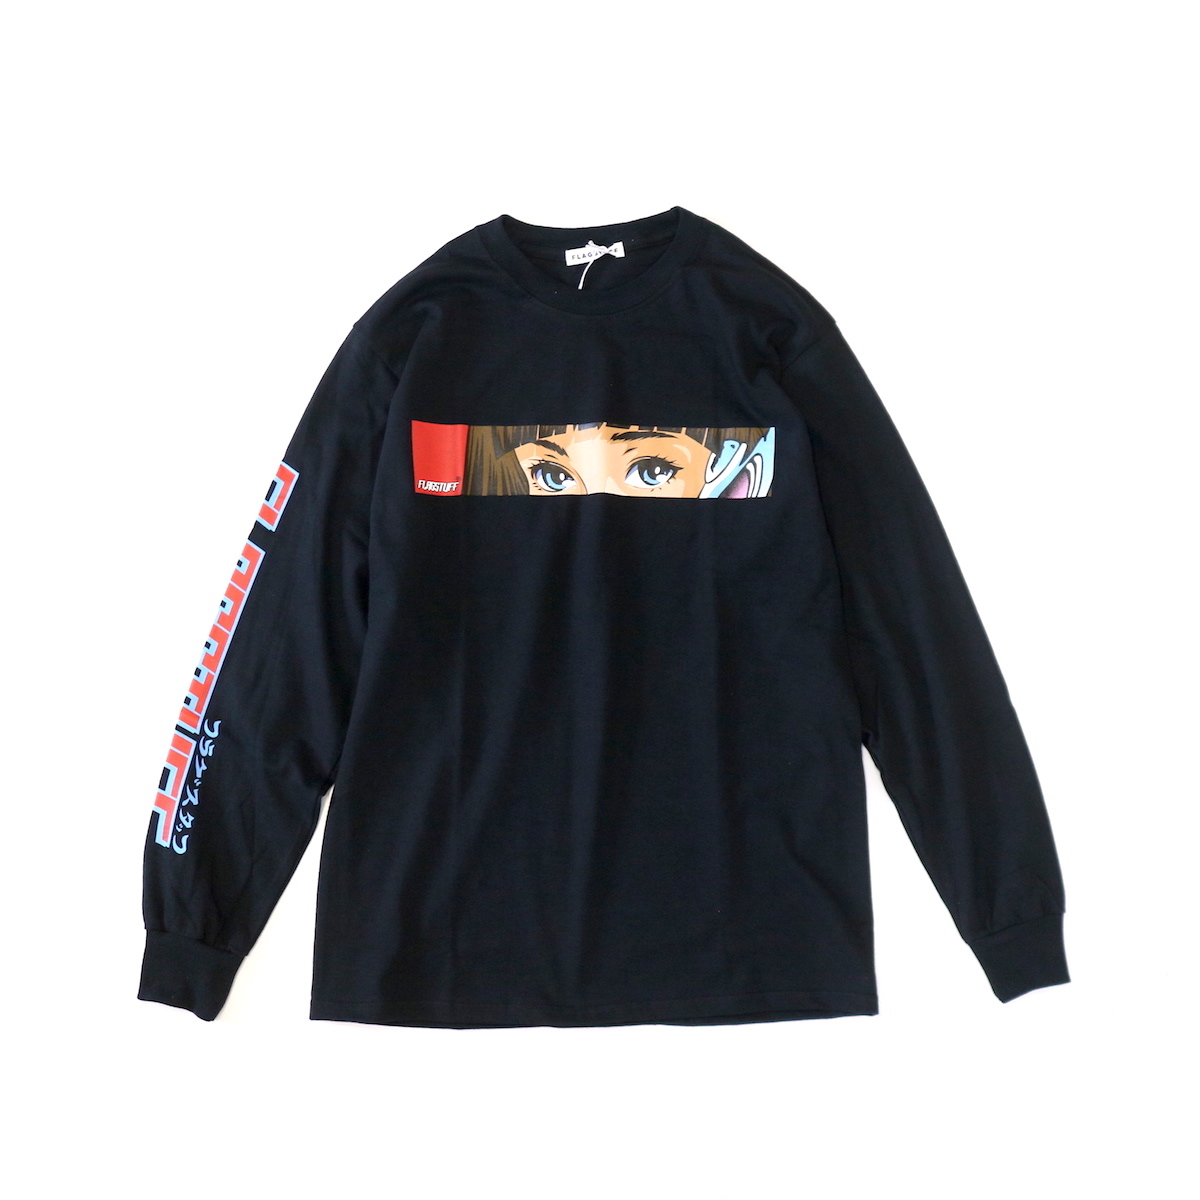 F-LAGSTUF-F / Dream Long Sleeve Tee -Black